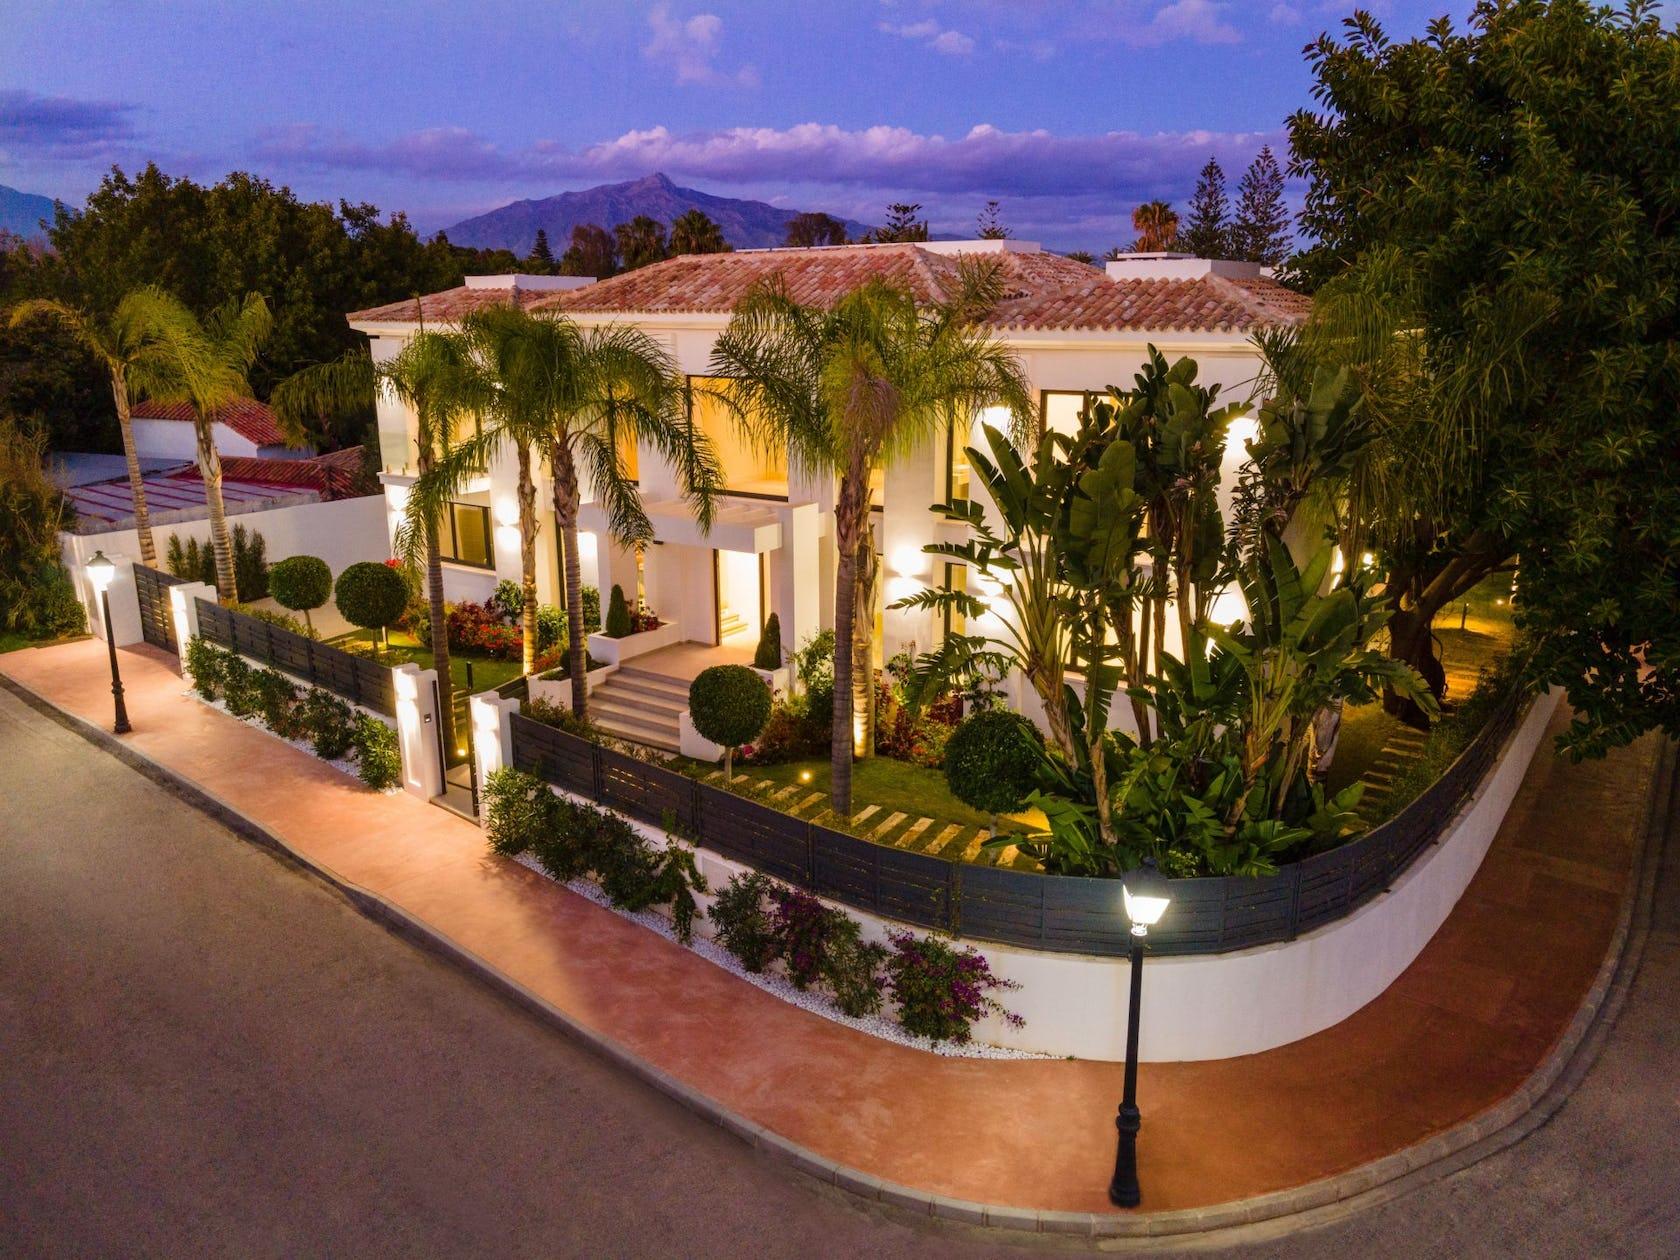 villa building housing house hotel resort tree plant